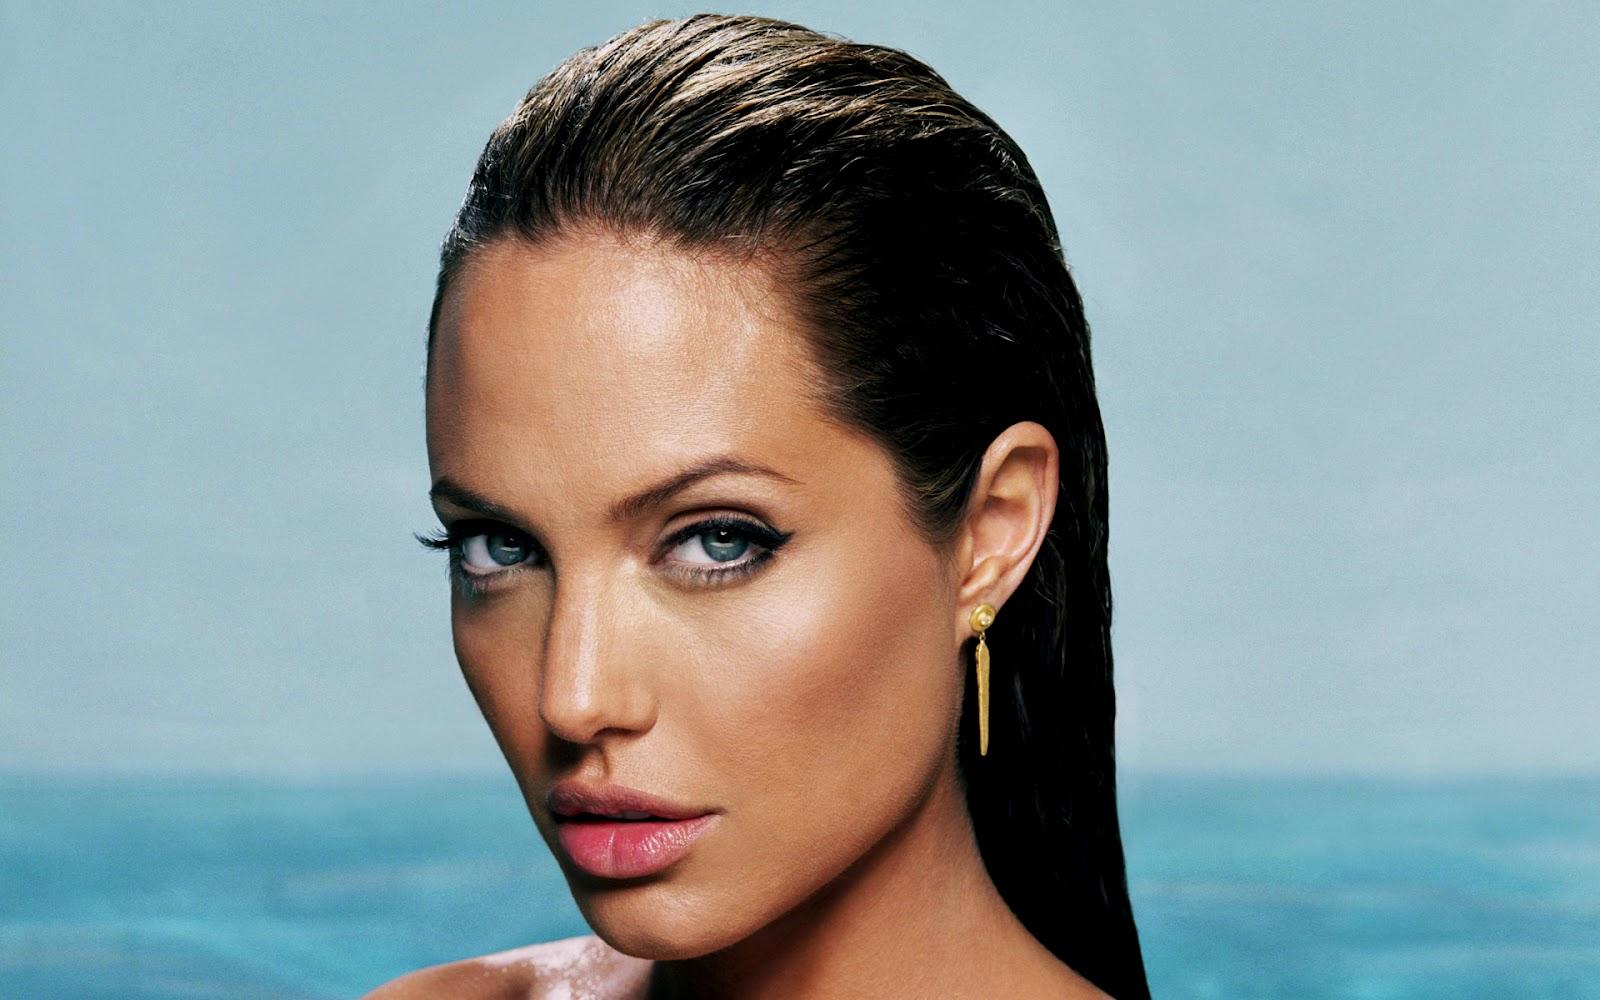 http://4.bp.blogspot.com/-ULDrP-7xfzE/UFGwgZVxokI/AAAAAAAAjnw/RlpYWB8ZRfk/s1600/Angelina+jolie+(26).jpg